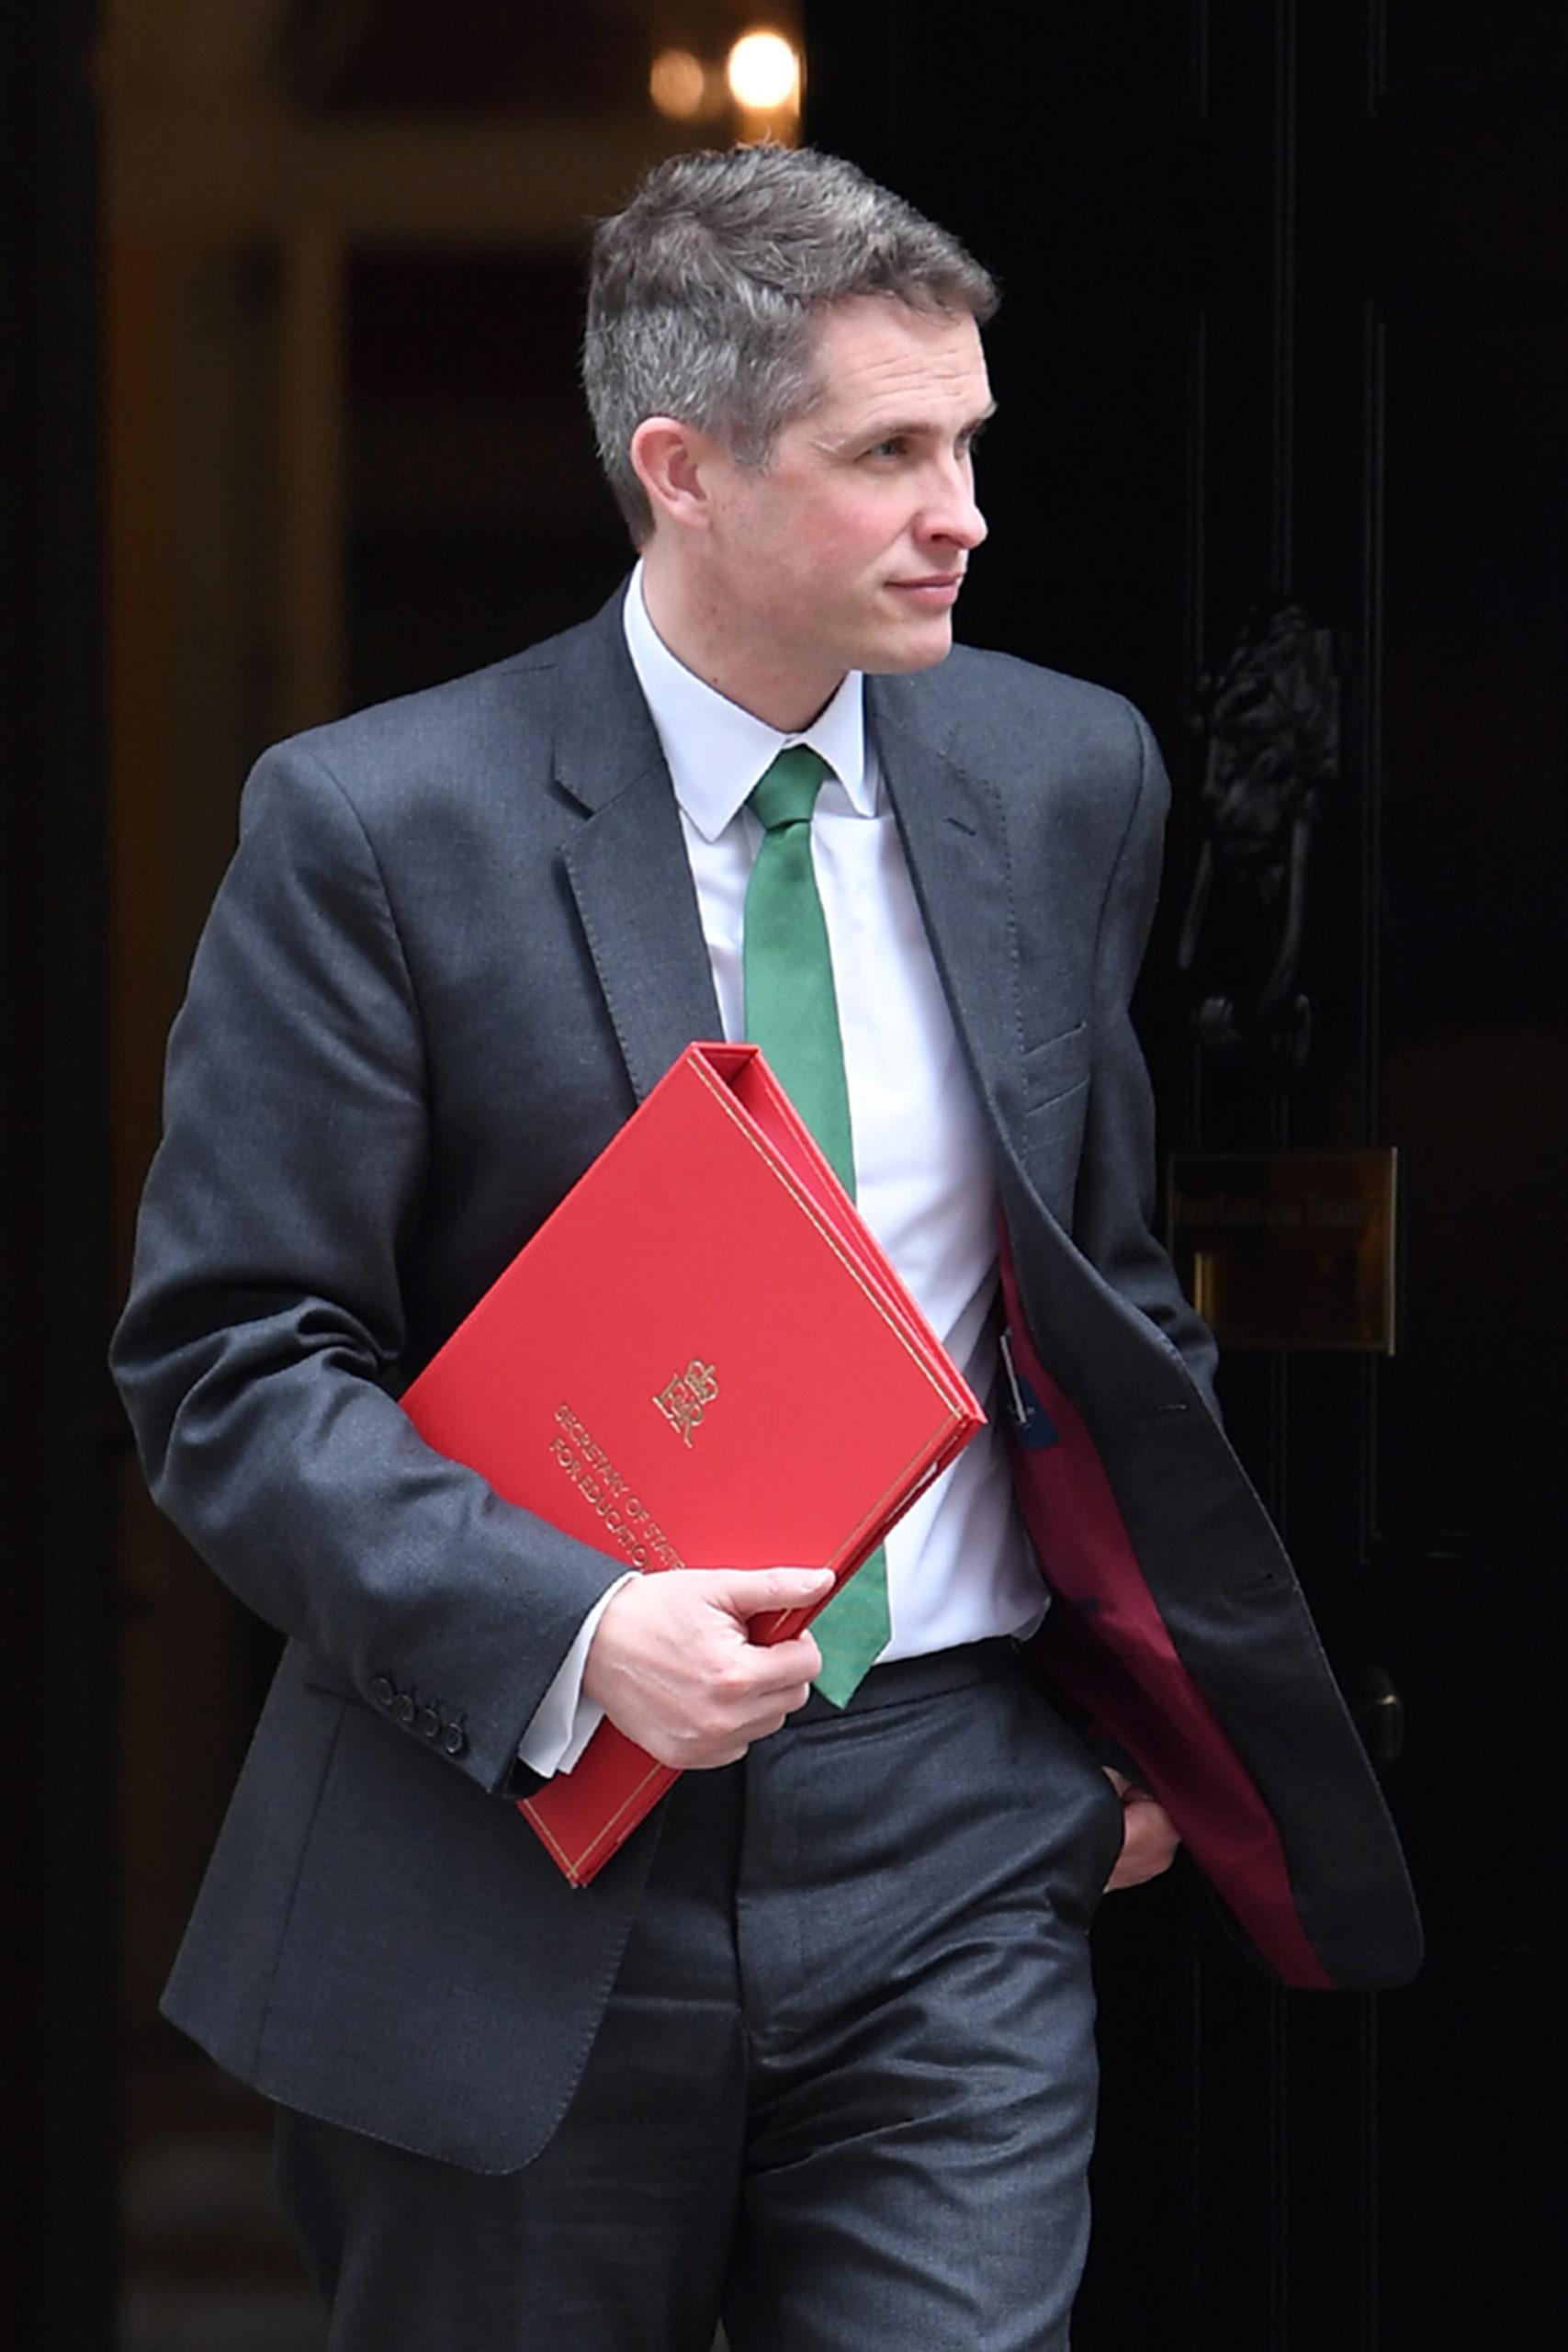 Piers Morgan education secretary